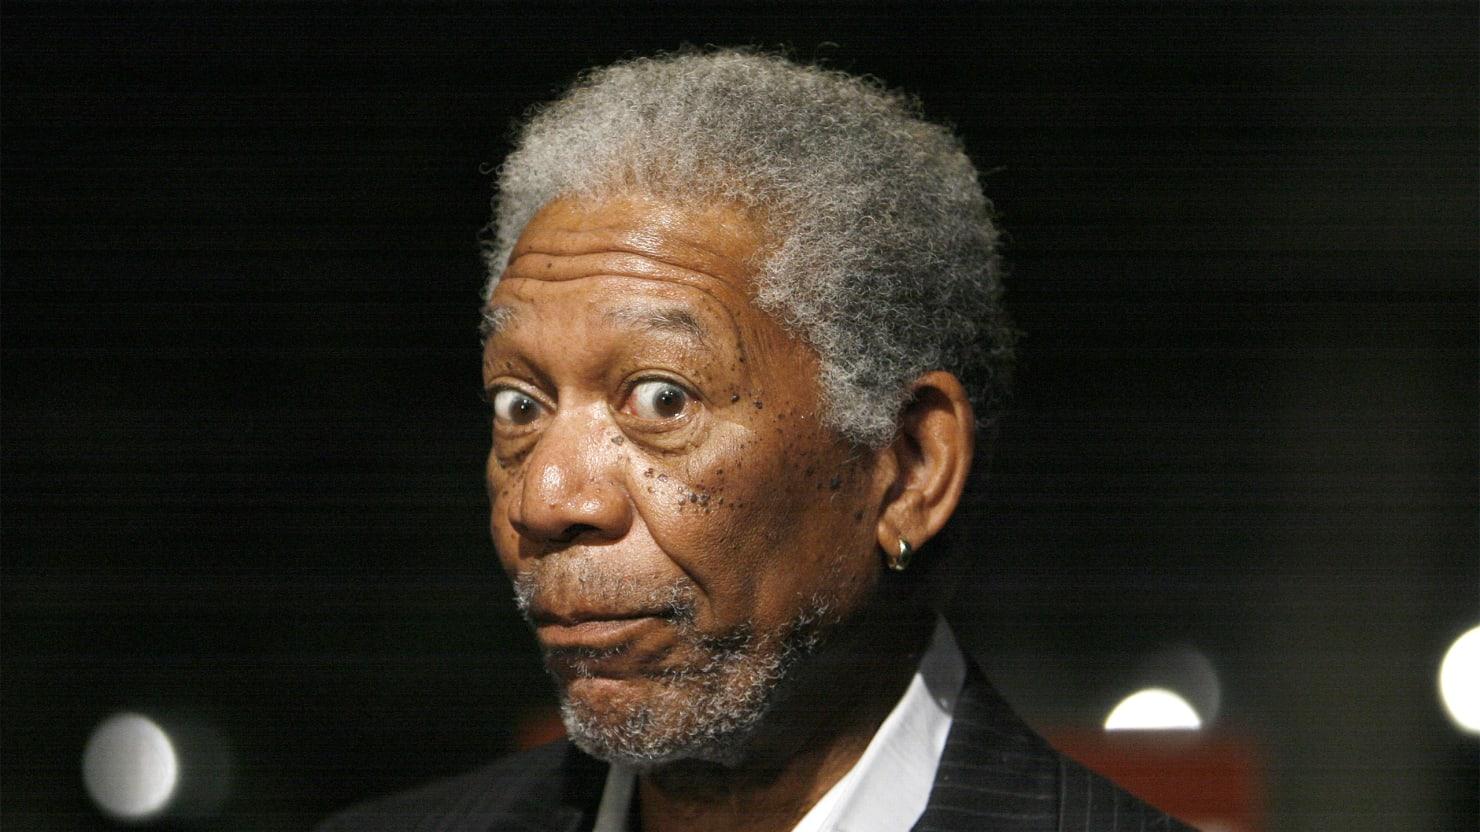 Morgan Freeman >> Morgan Freeman Shoots Straight On Legalizing Marijuana And His